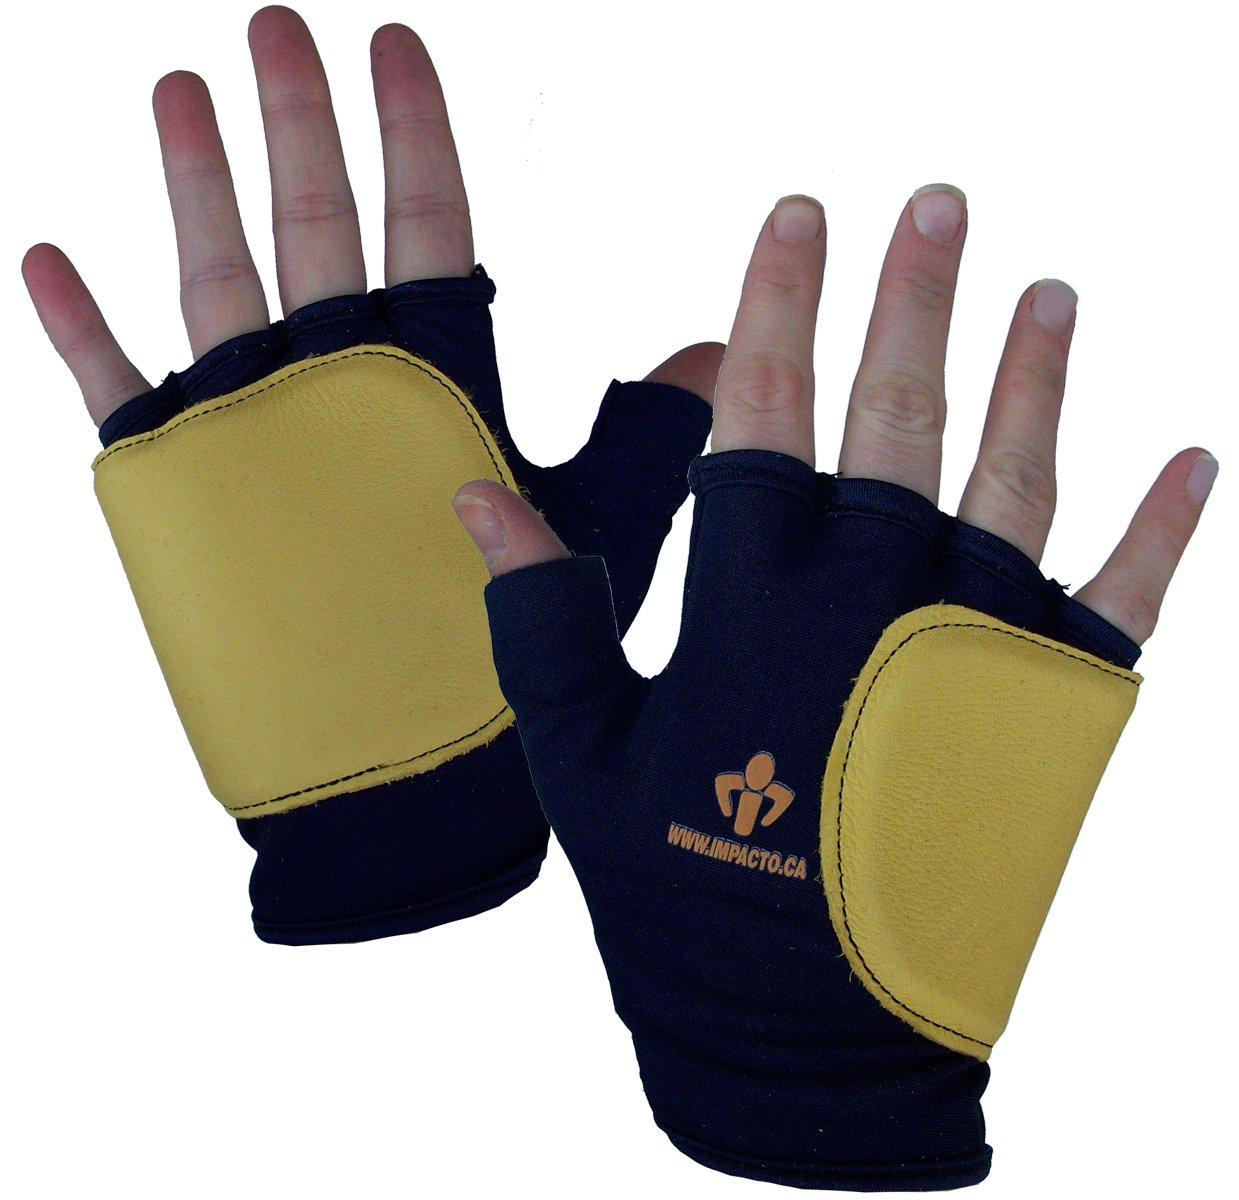 Impacto 50320110040 Anti-Impact Glove, Blue/Yellow